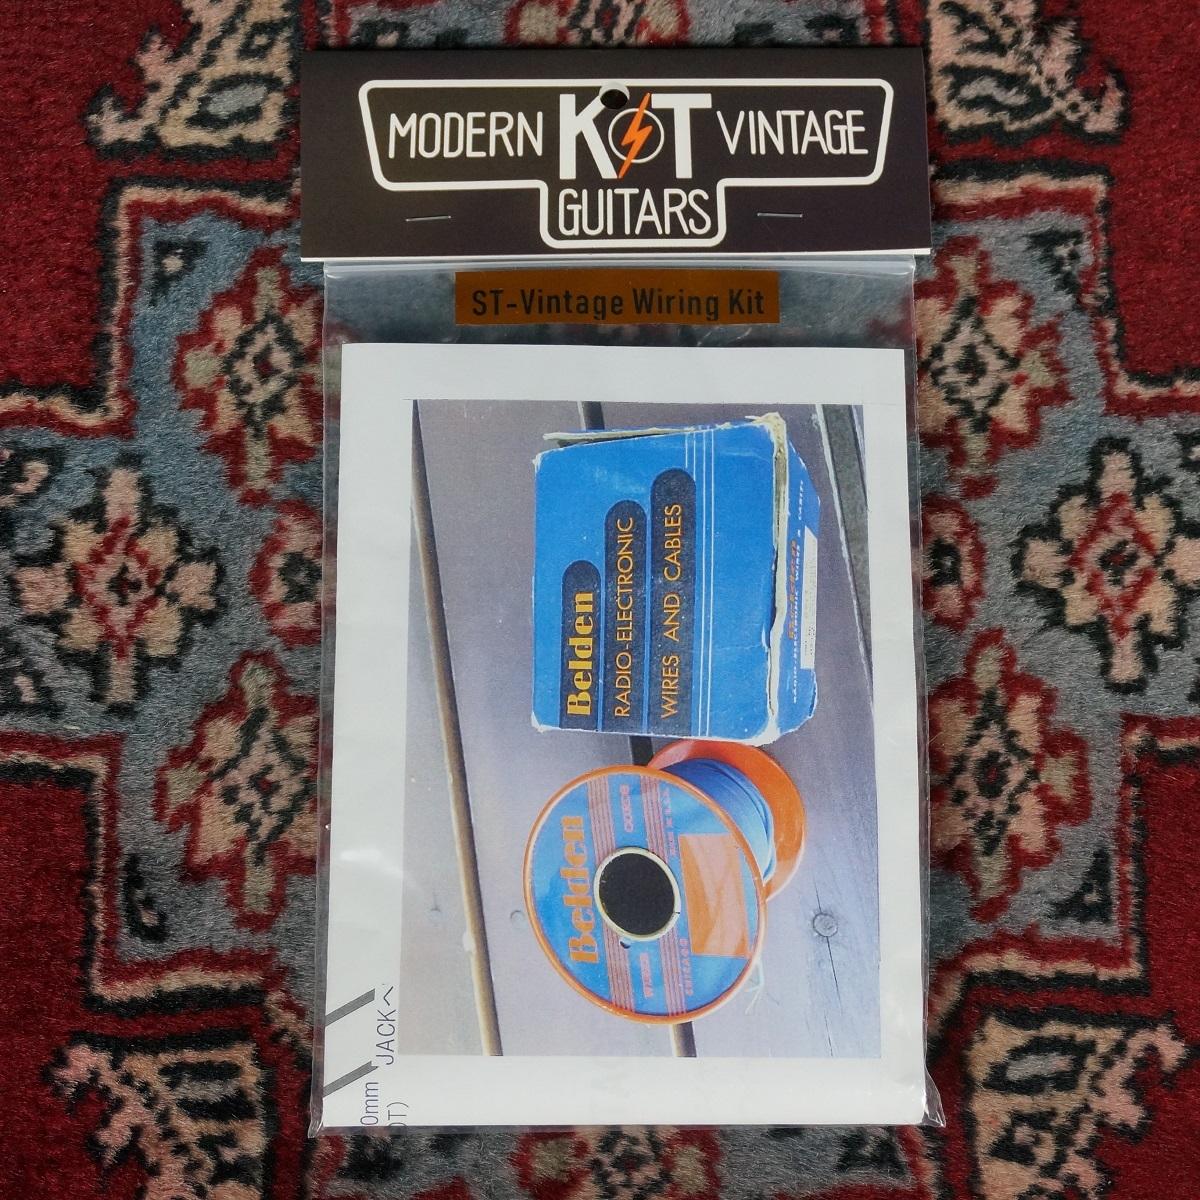 K&T MODERN VINTAGE GUITARS ST-Vintage Wiring Kit 【ラストストック!!稀少なヴィンテージ・ベルデン・ワイヤー!!ST用】